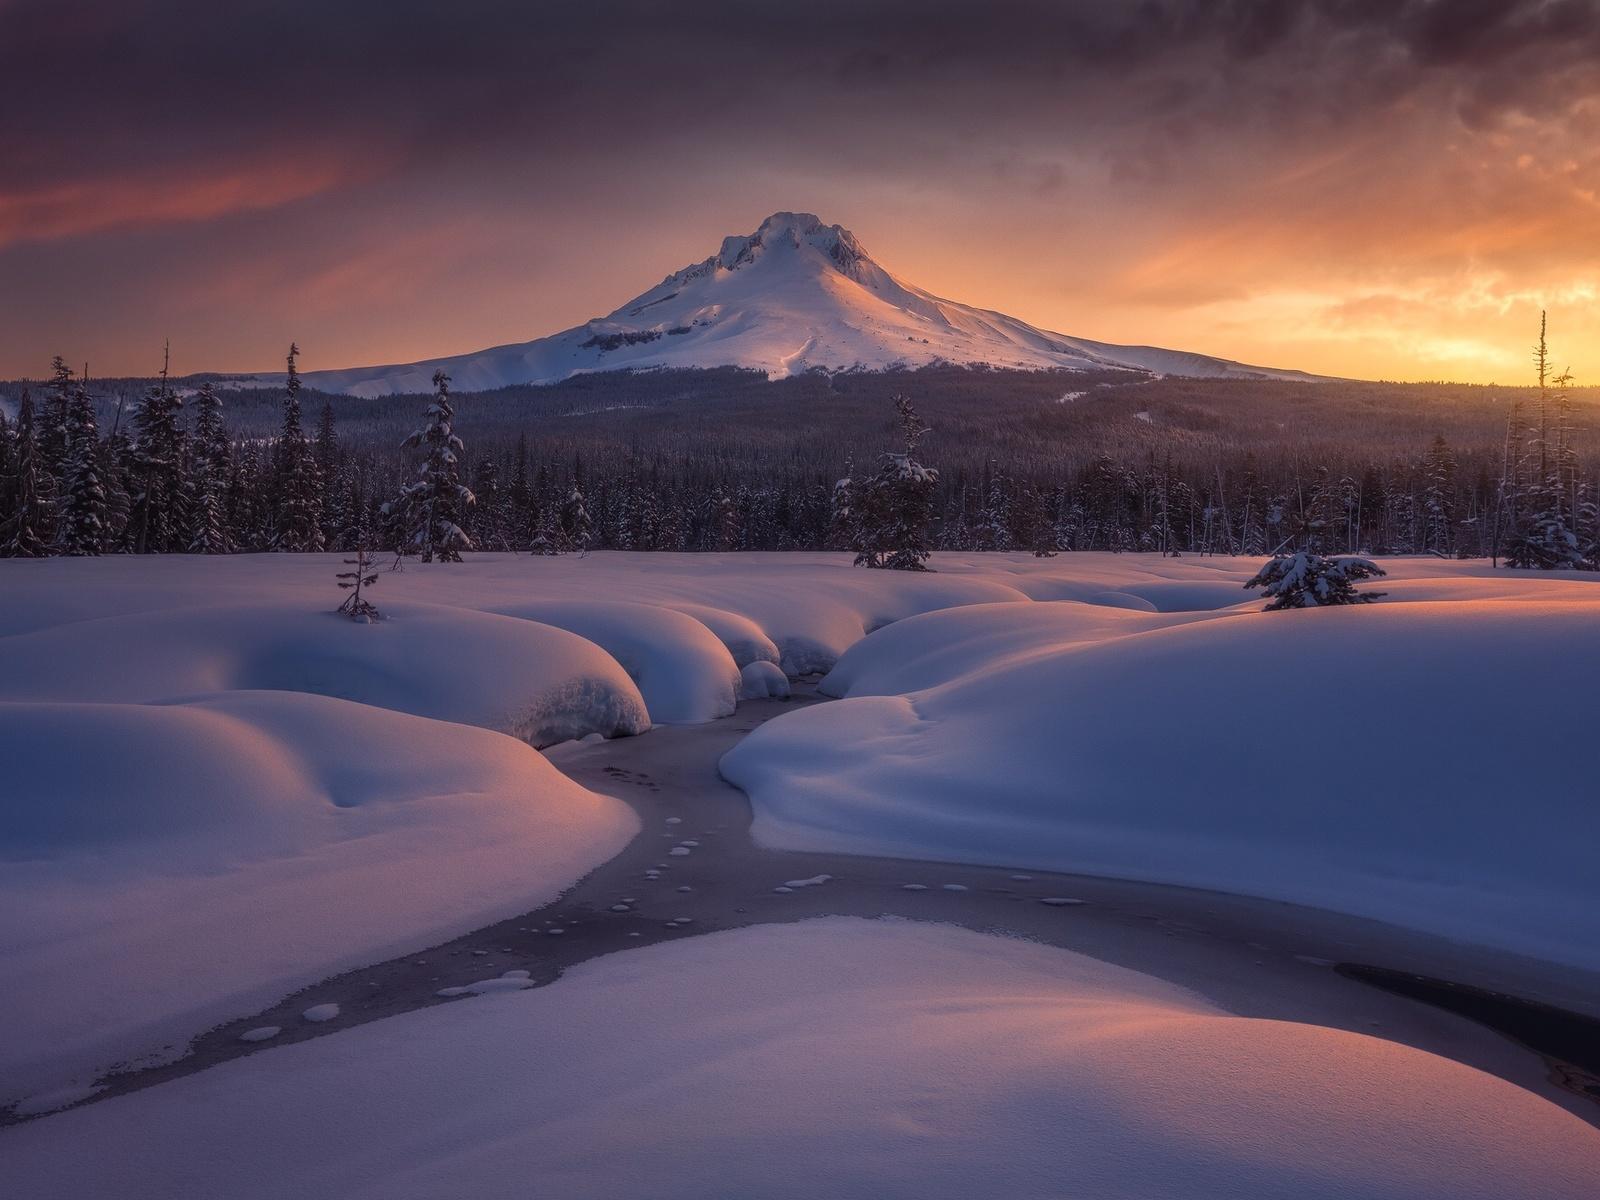 гора, лес, речка, снег, сугробы